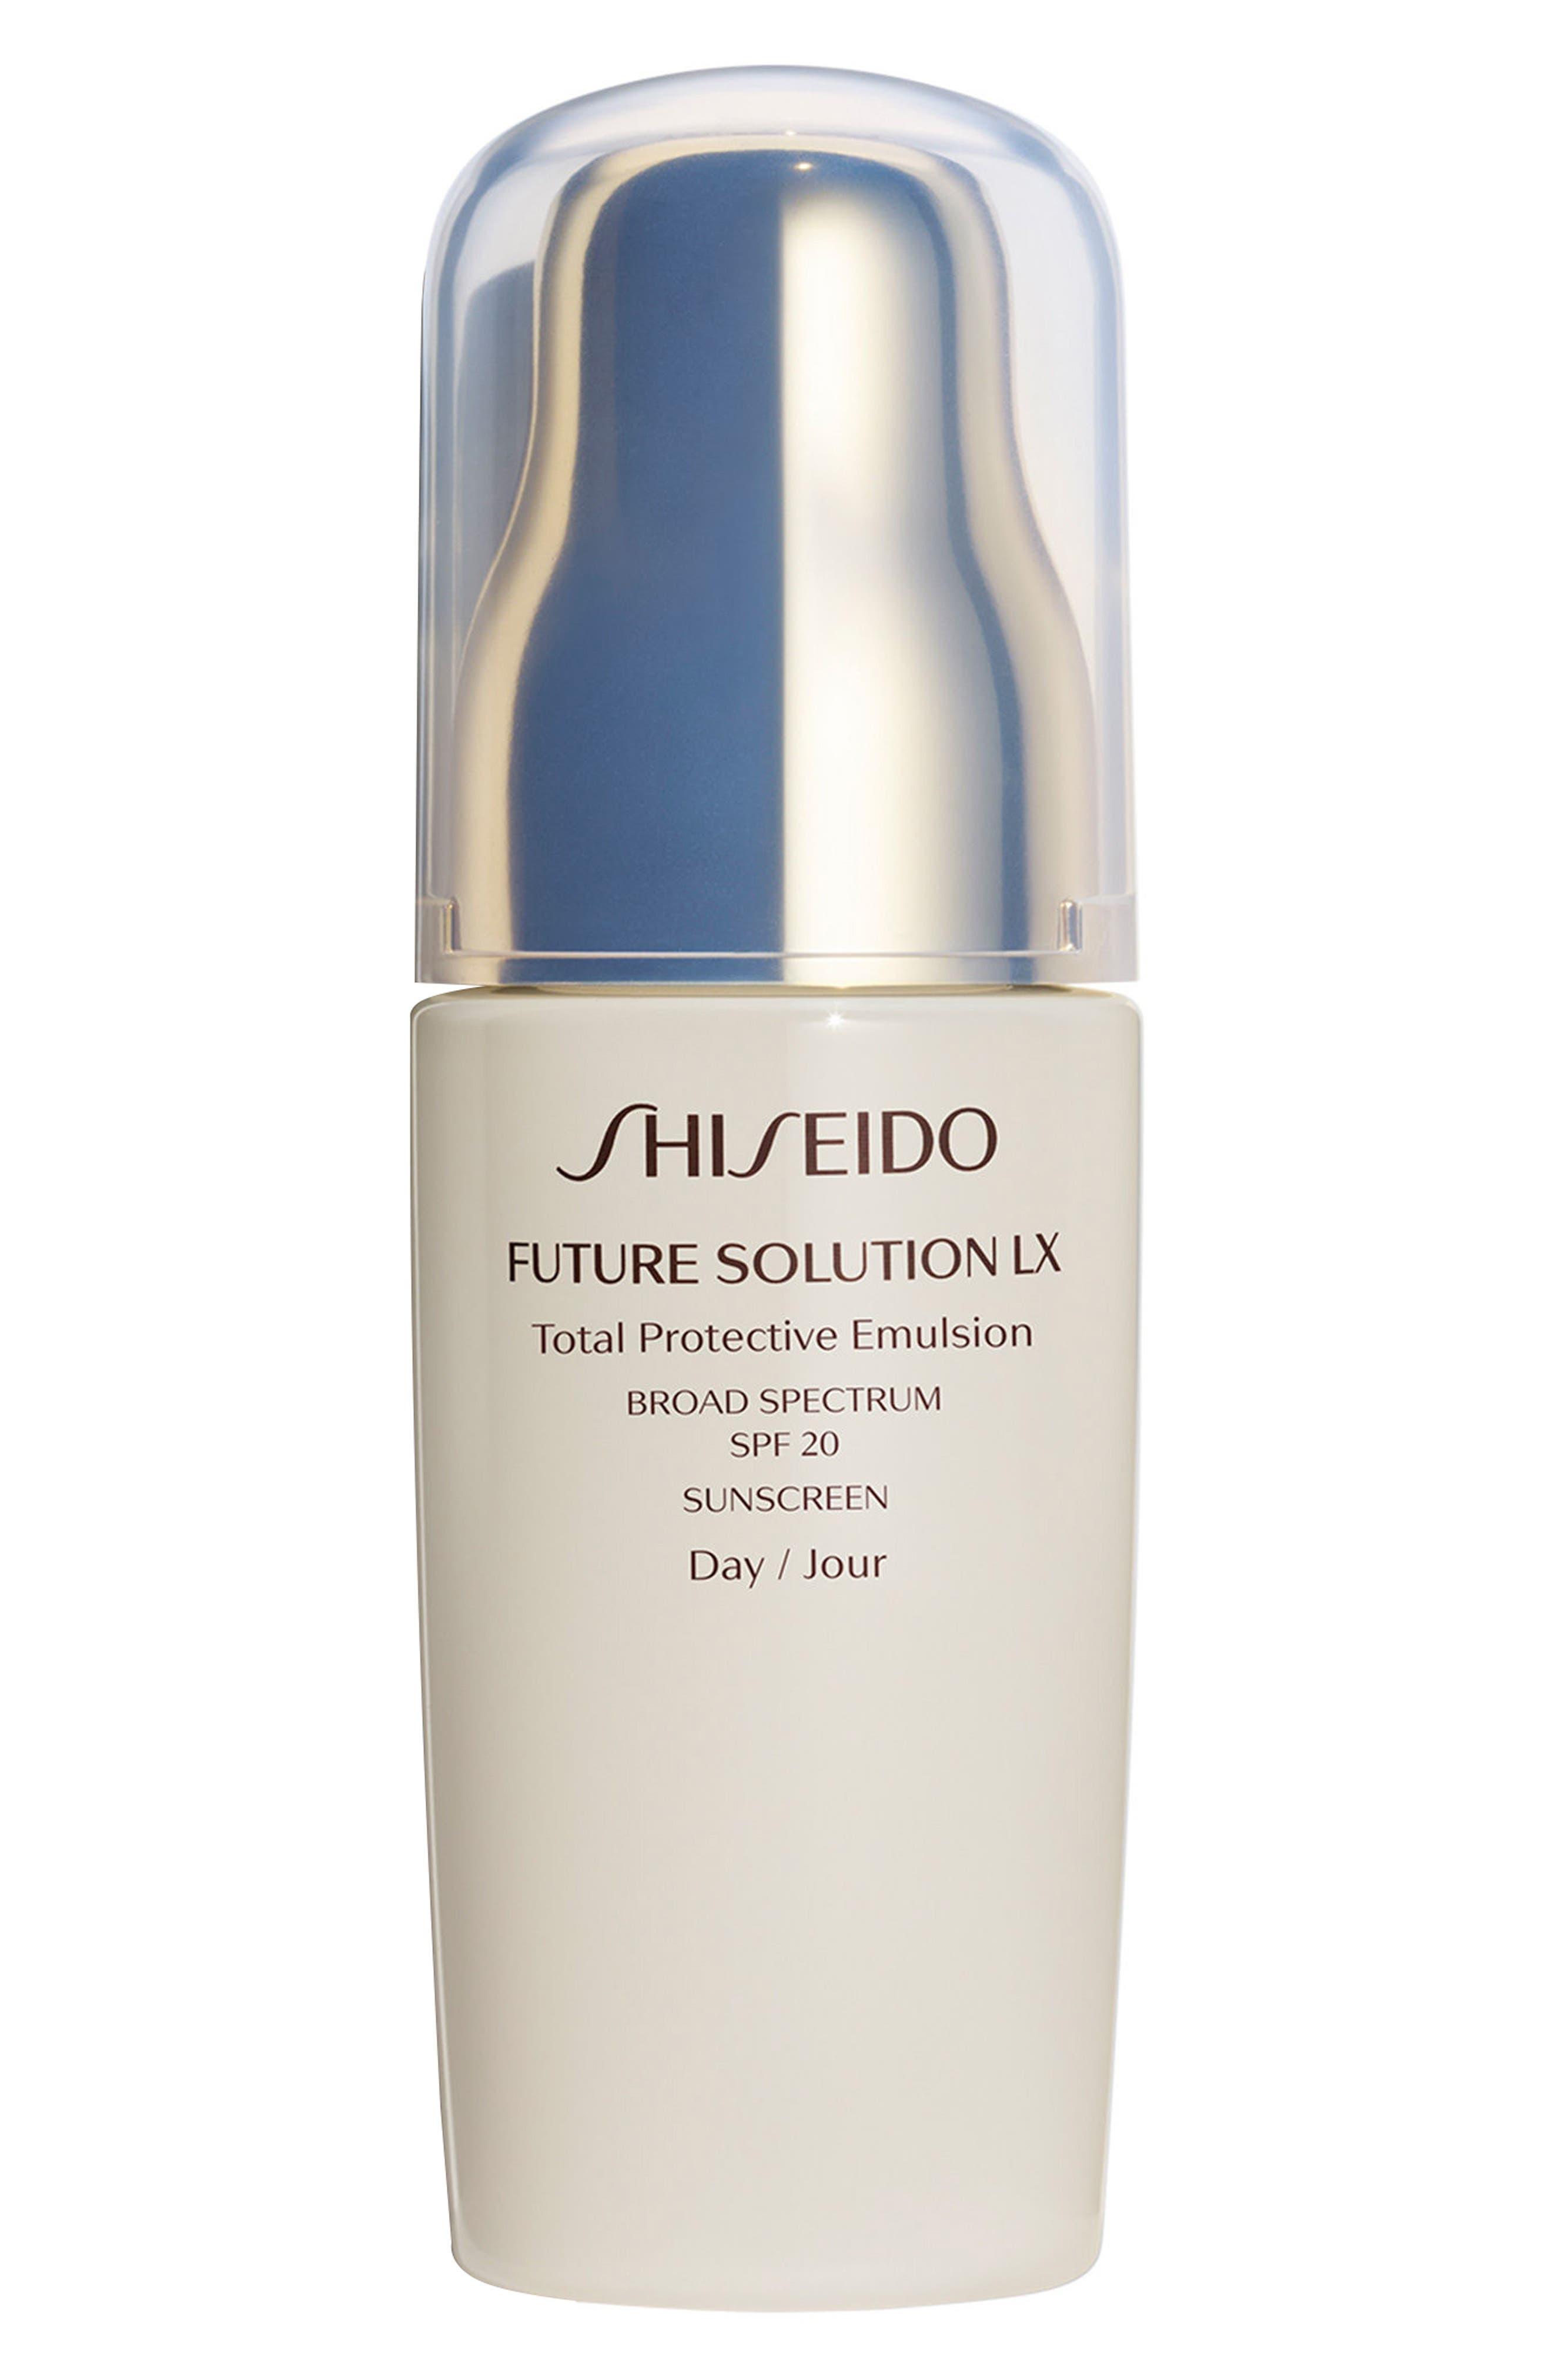 Shiseido Future Solution Lx Total Protective Emulsion Broad Spectrum Spf 20 Sunscreen